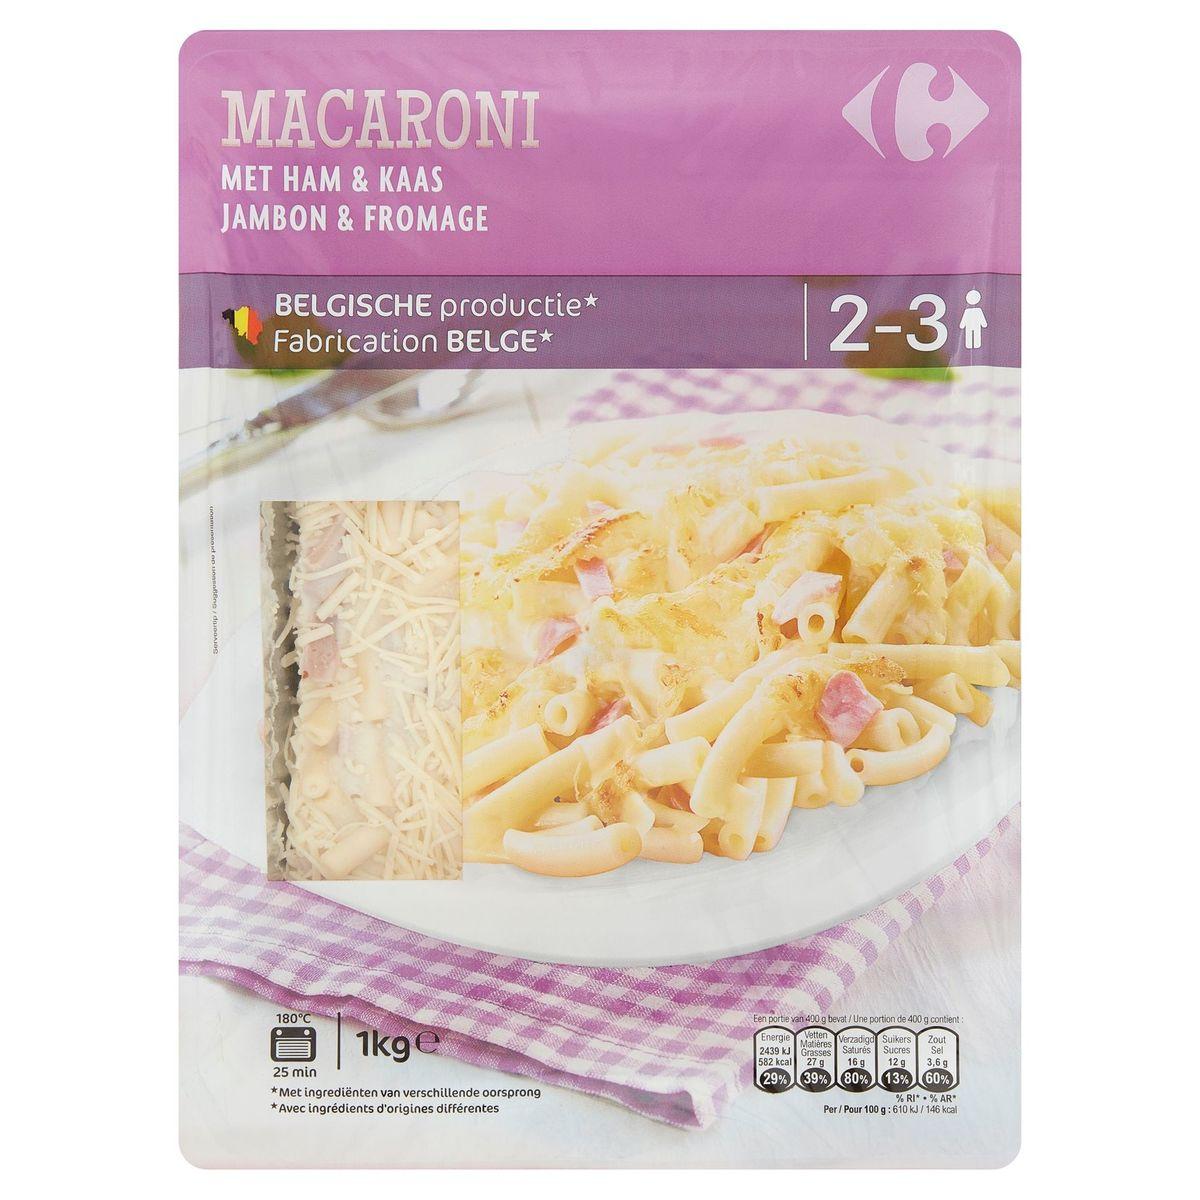 Carrefour Macaroni Jambon & Fromage 1 kg